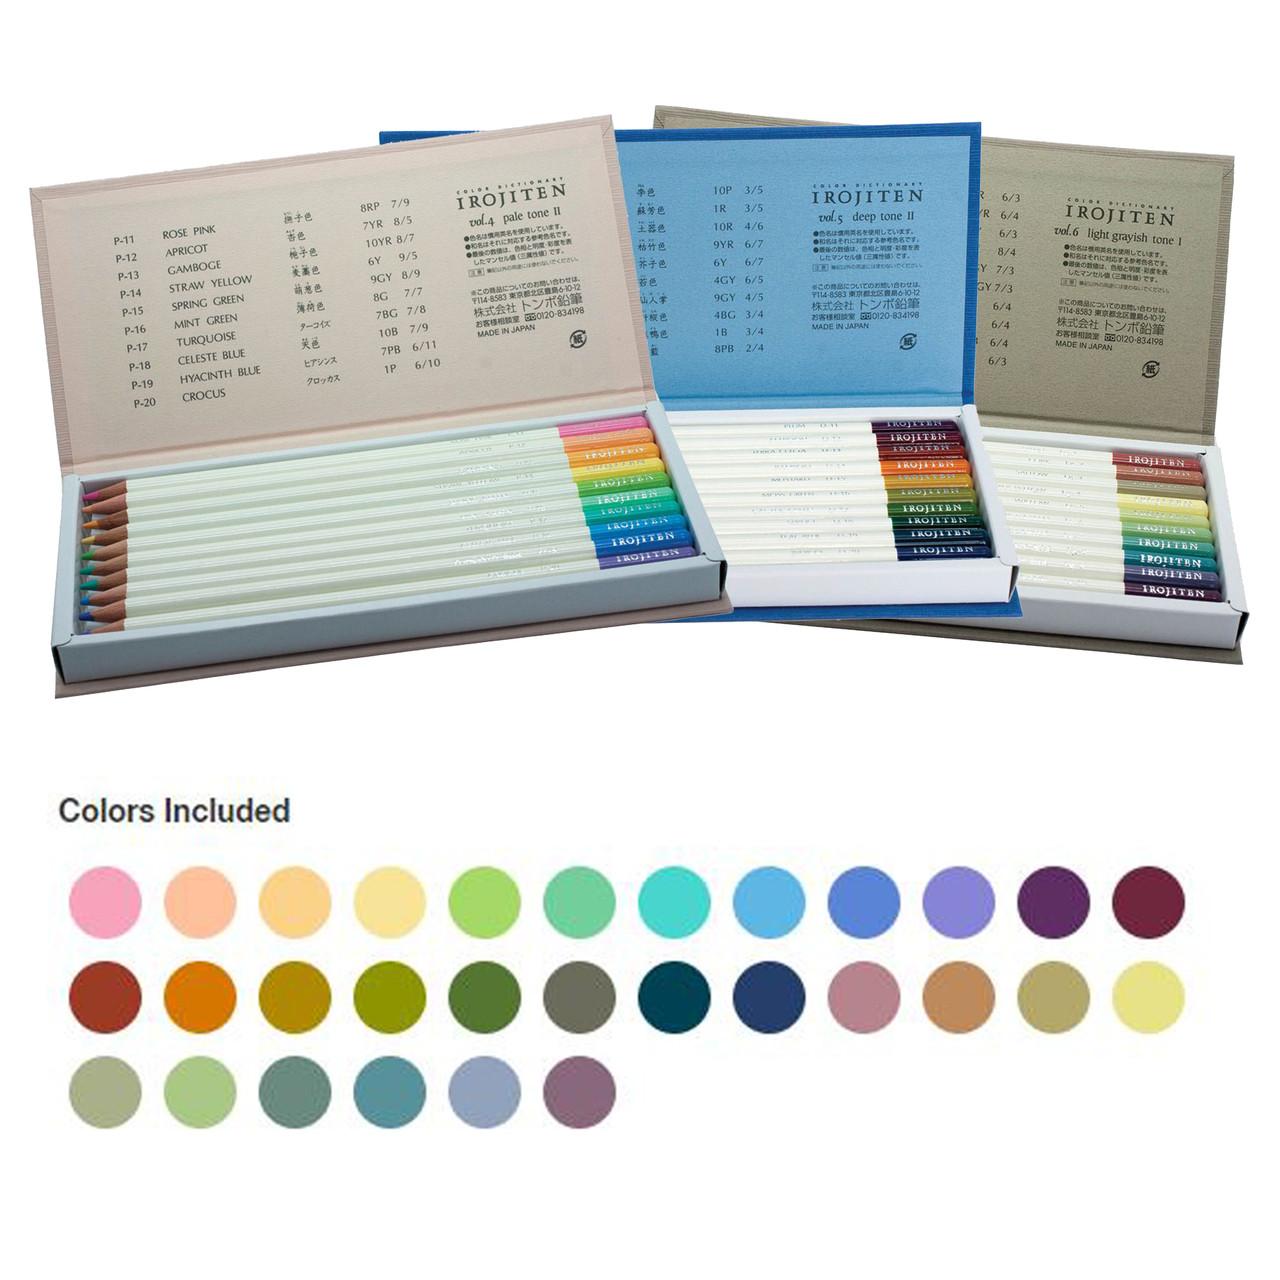 Irojiten Pencil 30-color Woodland Set